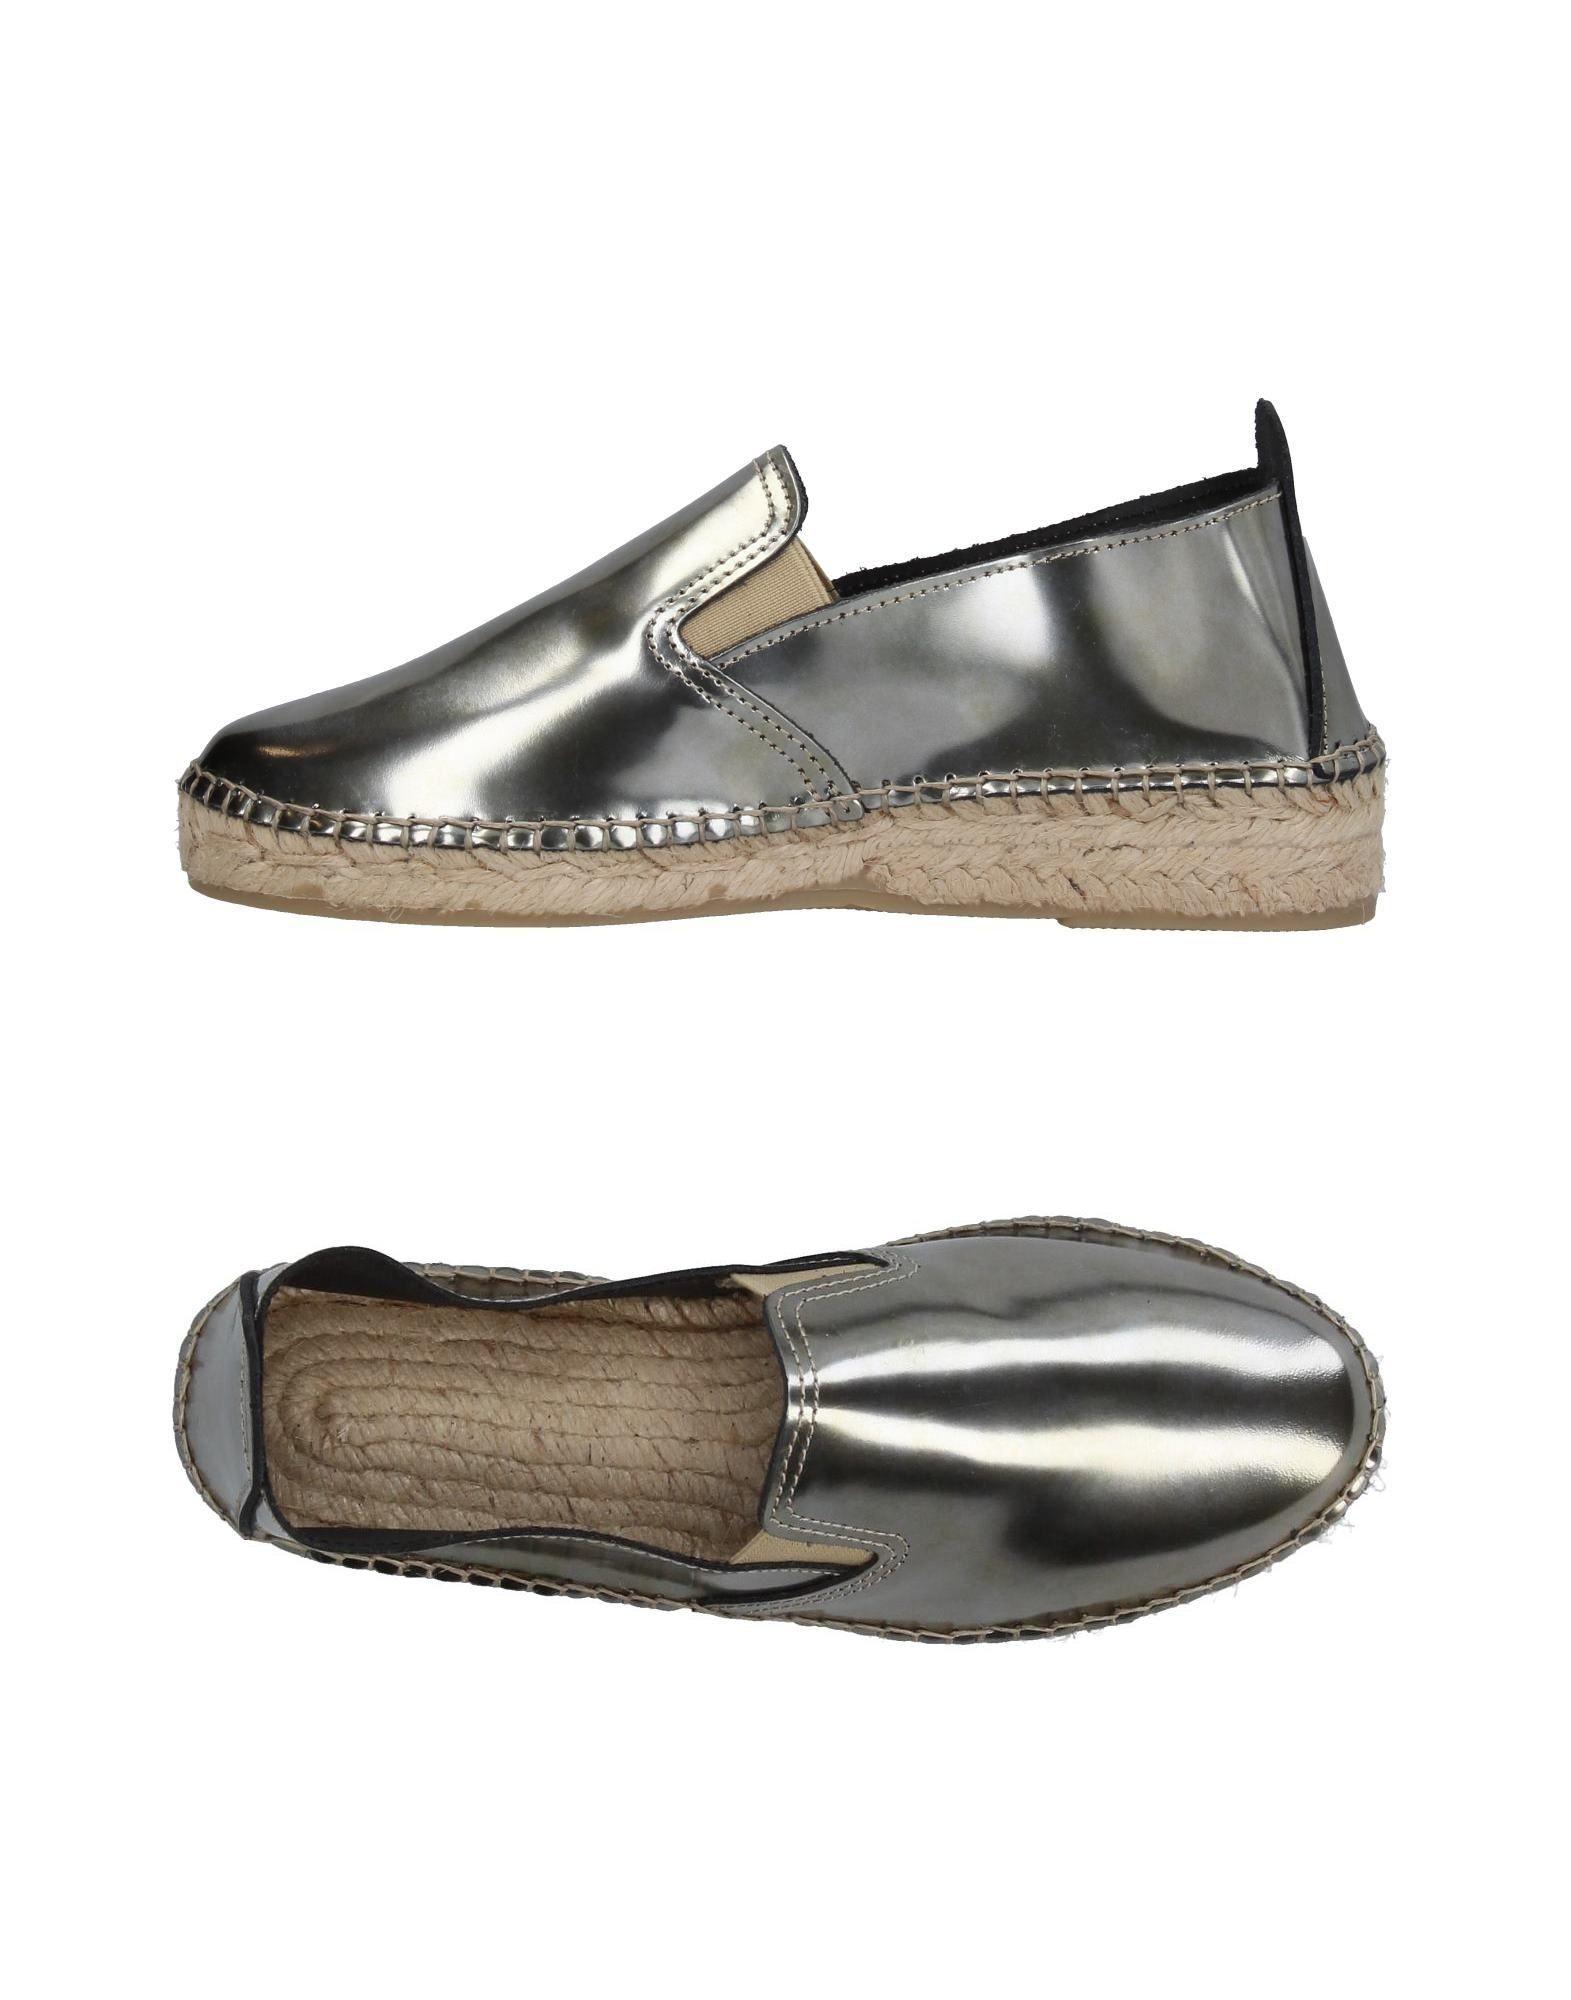 Prism Espadrilles Damen  11387969QU Gute Qualität beliebte Schuhe